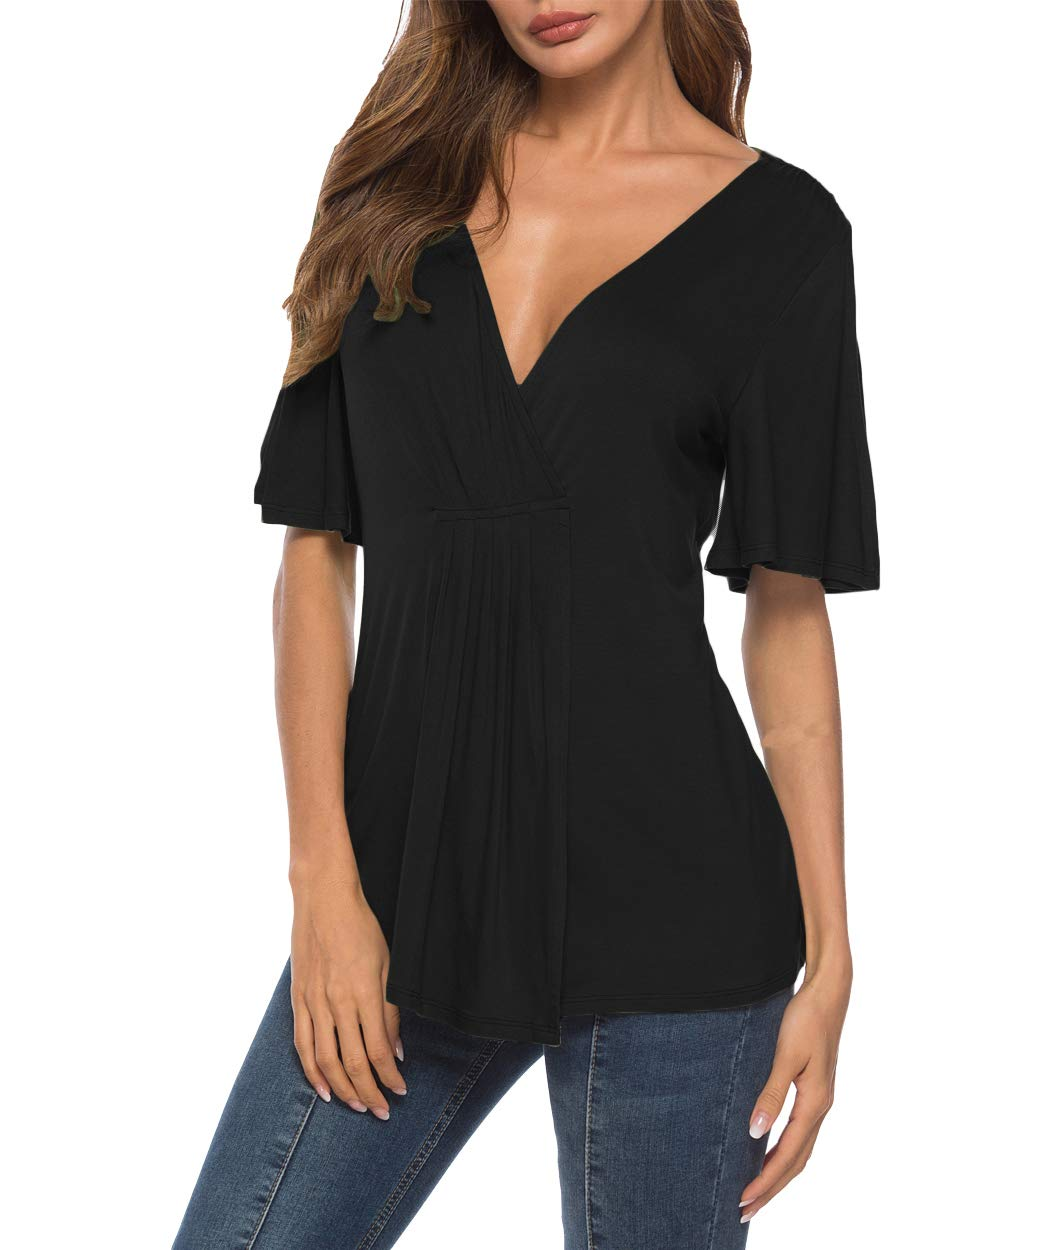 Eanklosco V Neck Shirts Womens Sexy Short Sleeve Cold Shoulder Tops Unique Ruffle Front Side Slit T Shirts (M, Black)